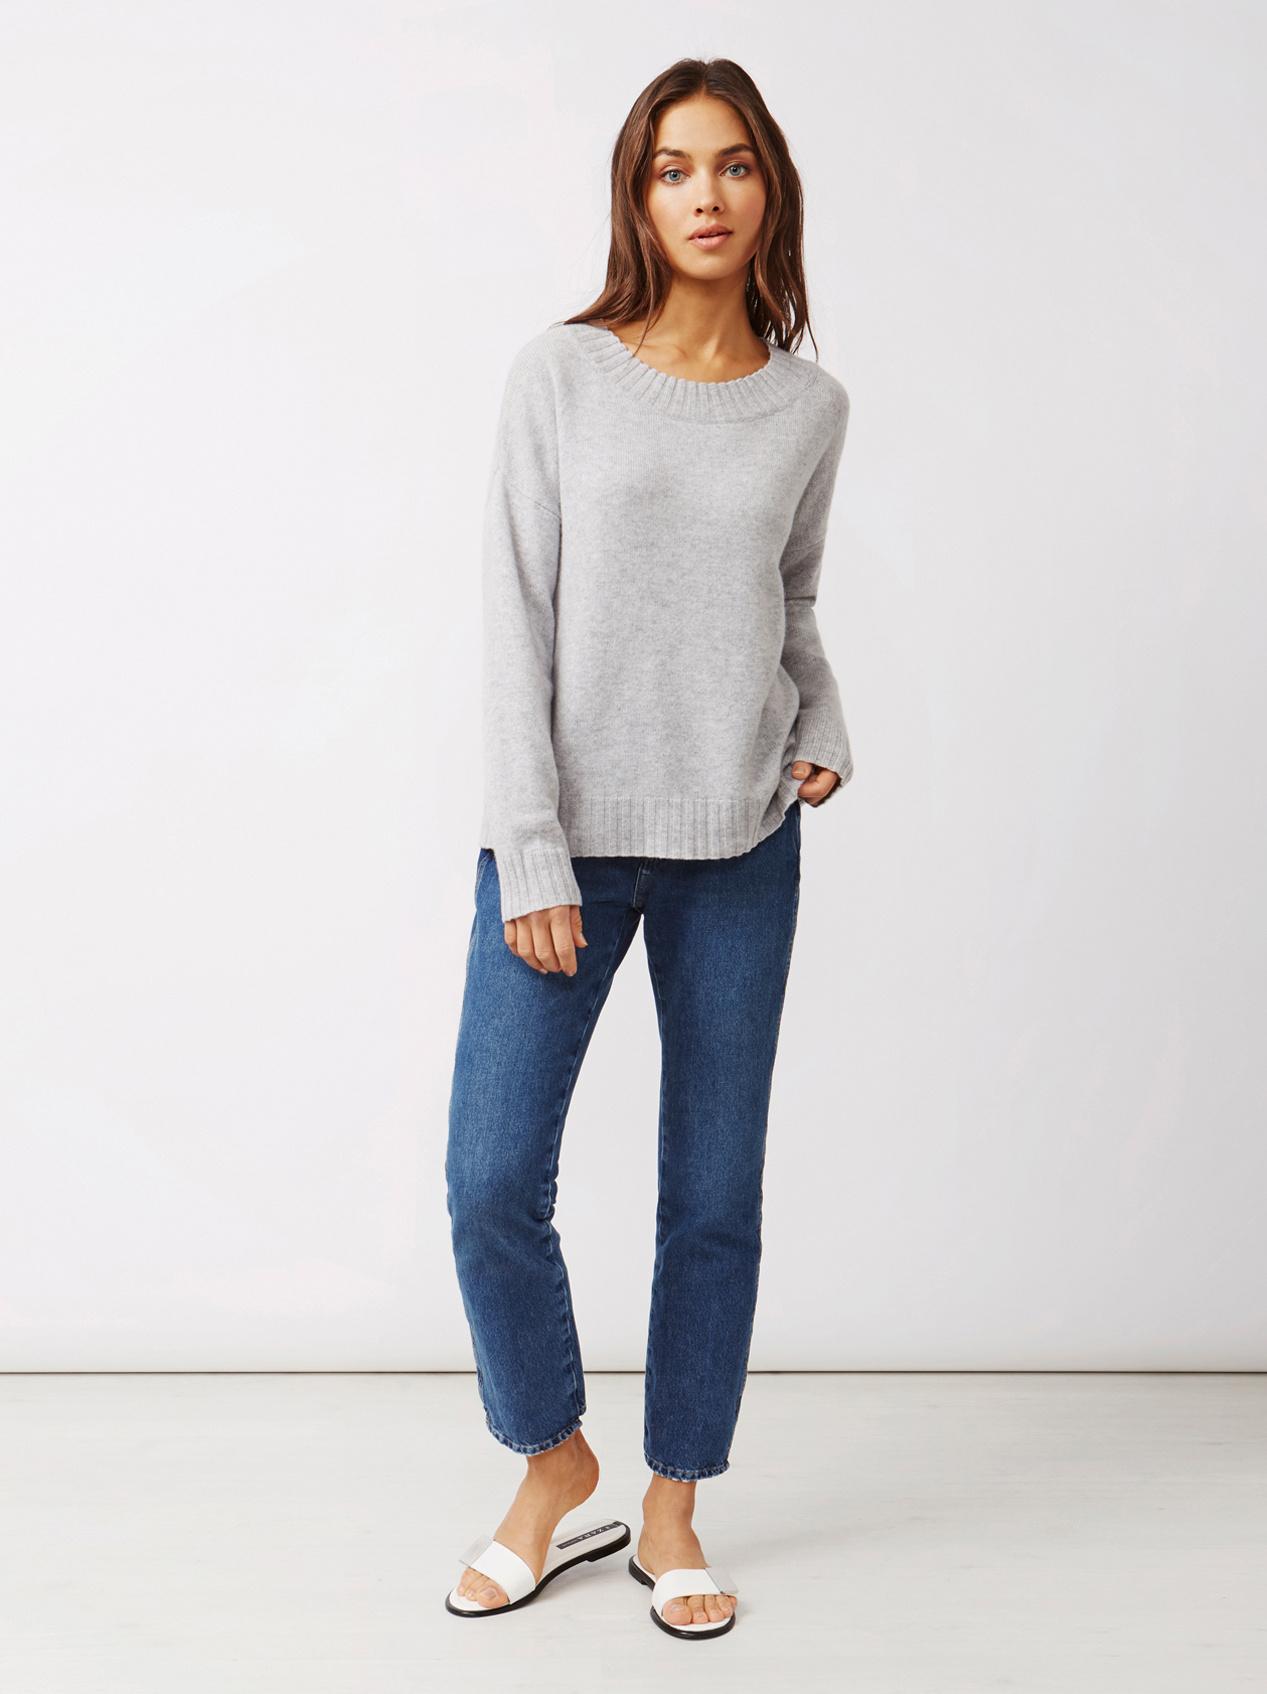 Soft Goat Women's Relaxed Sweater Light Grey